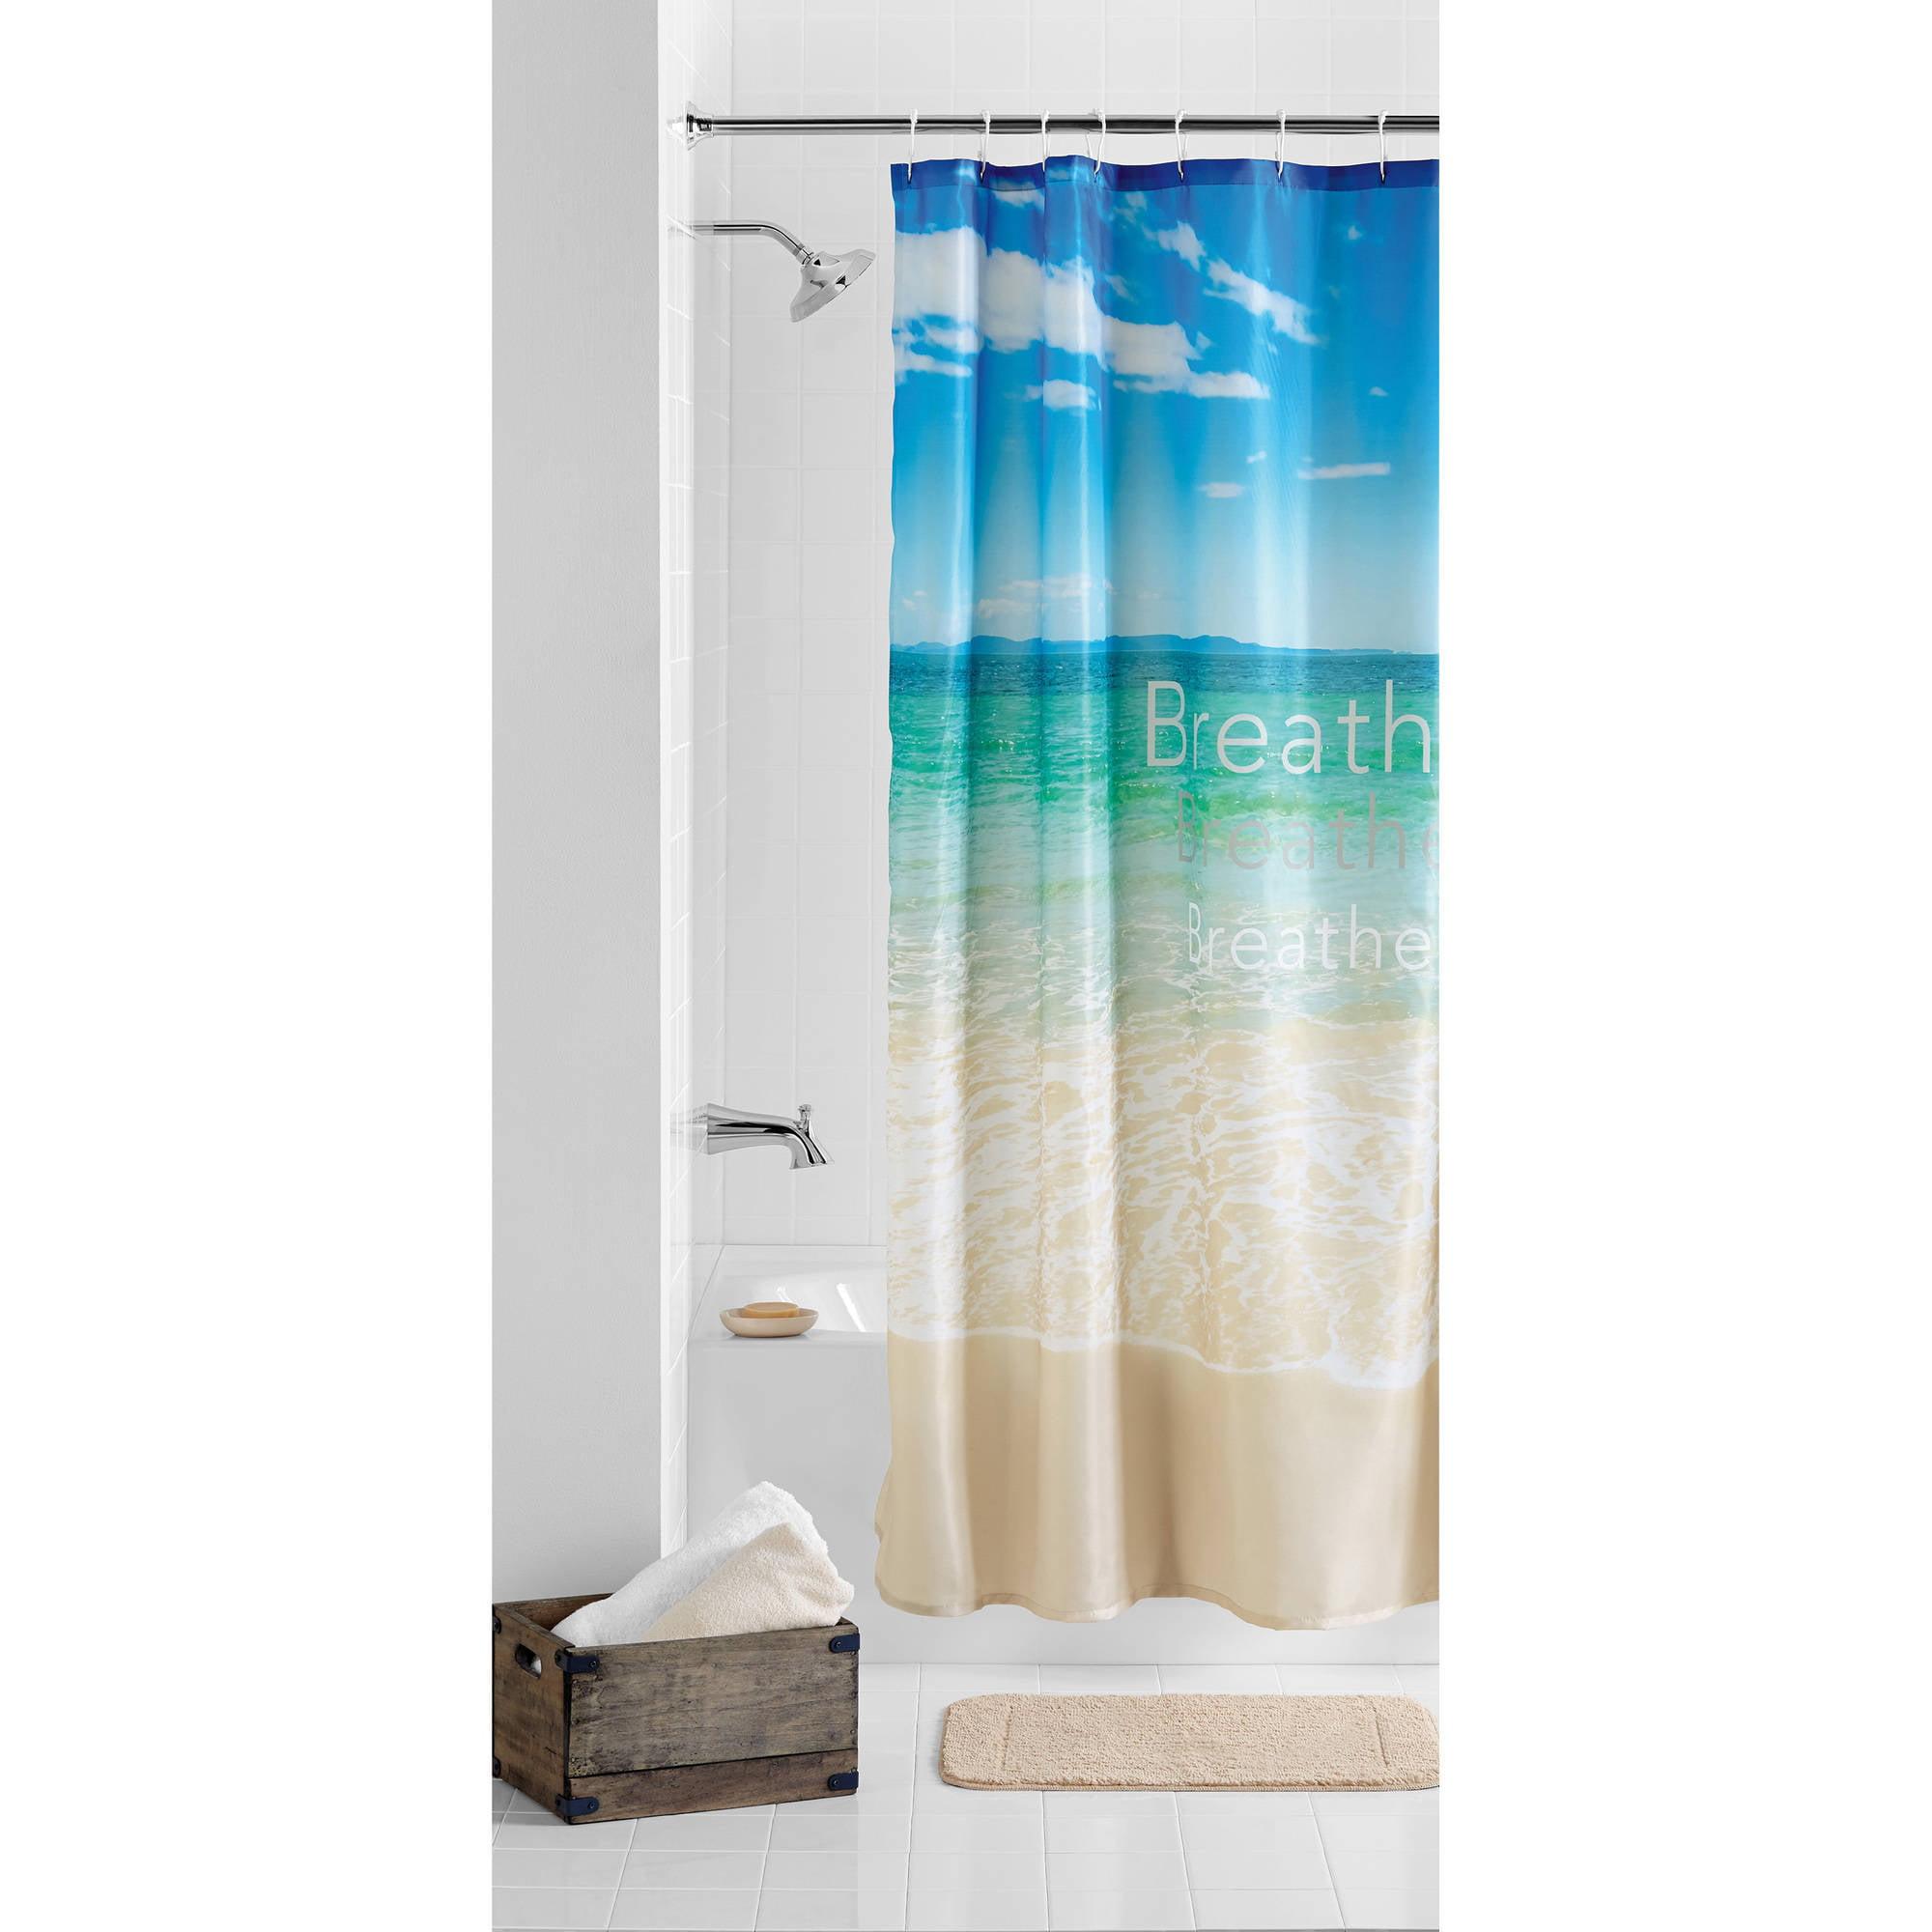 Mainstays Breathe Beach Polyester Printed Fabric Shower Curtain 1